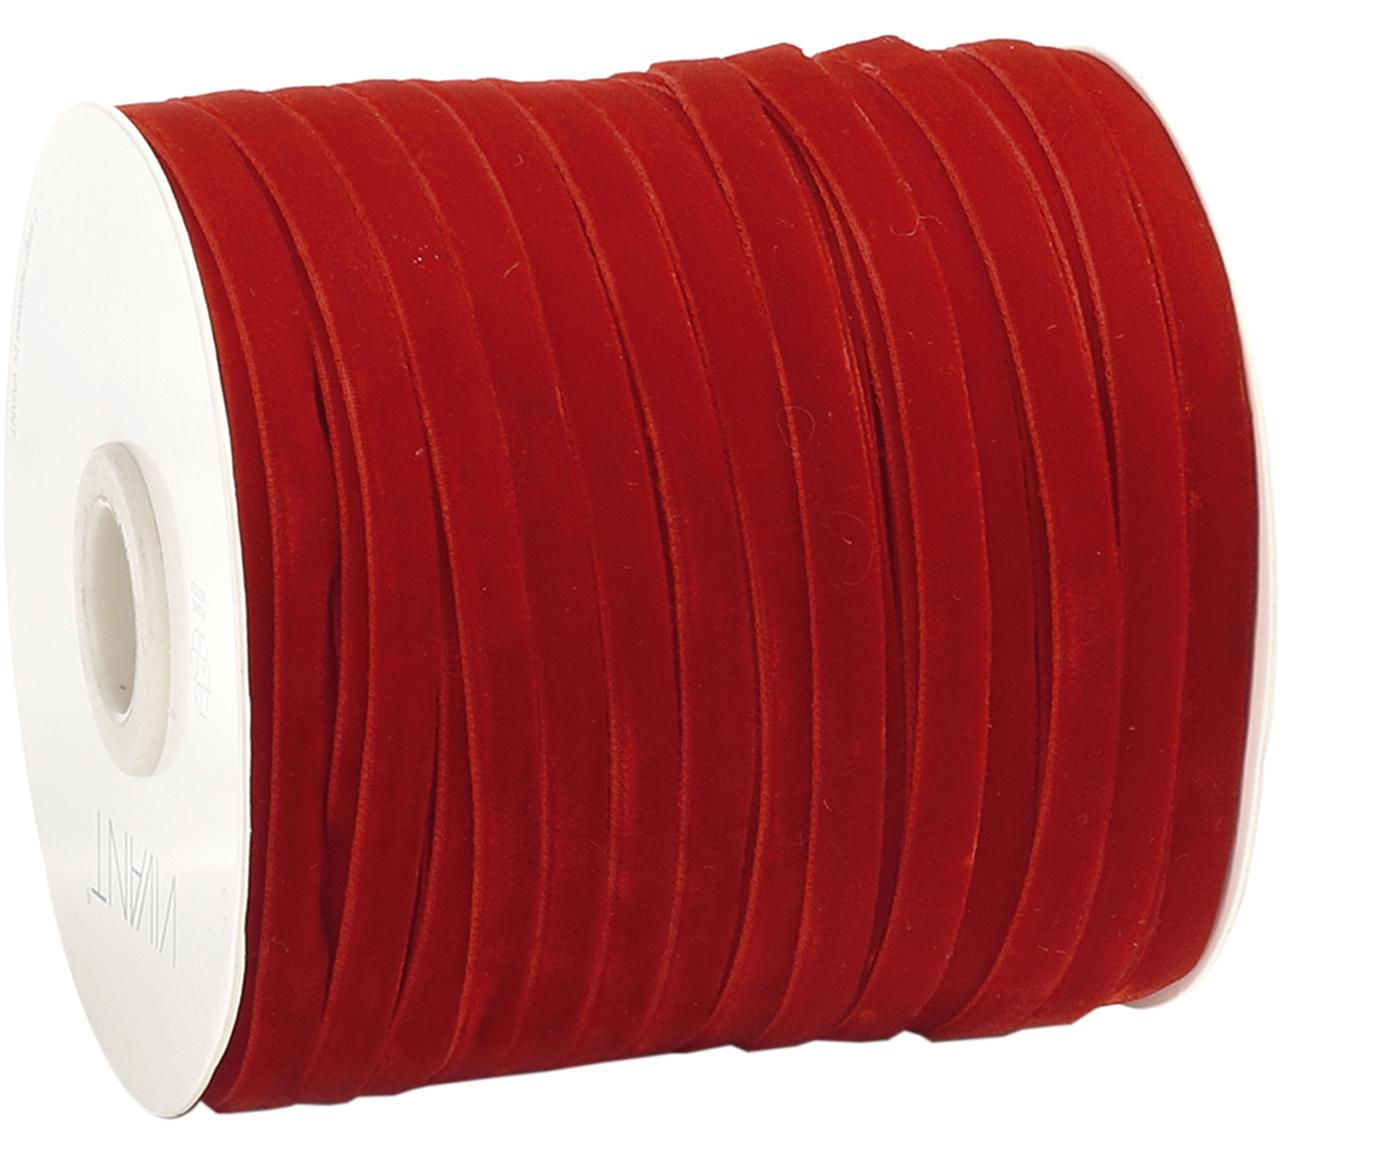 Nastro Velveta, Nylon, Rosso, Larg. 0,6 x Lung. 10000 cm